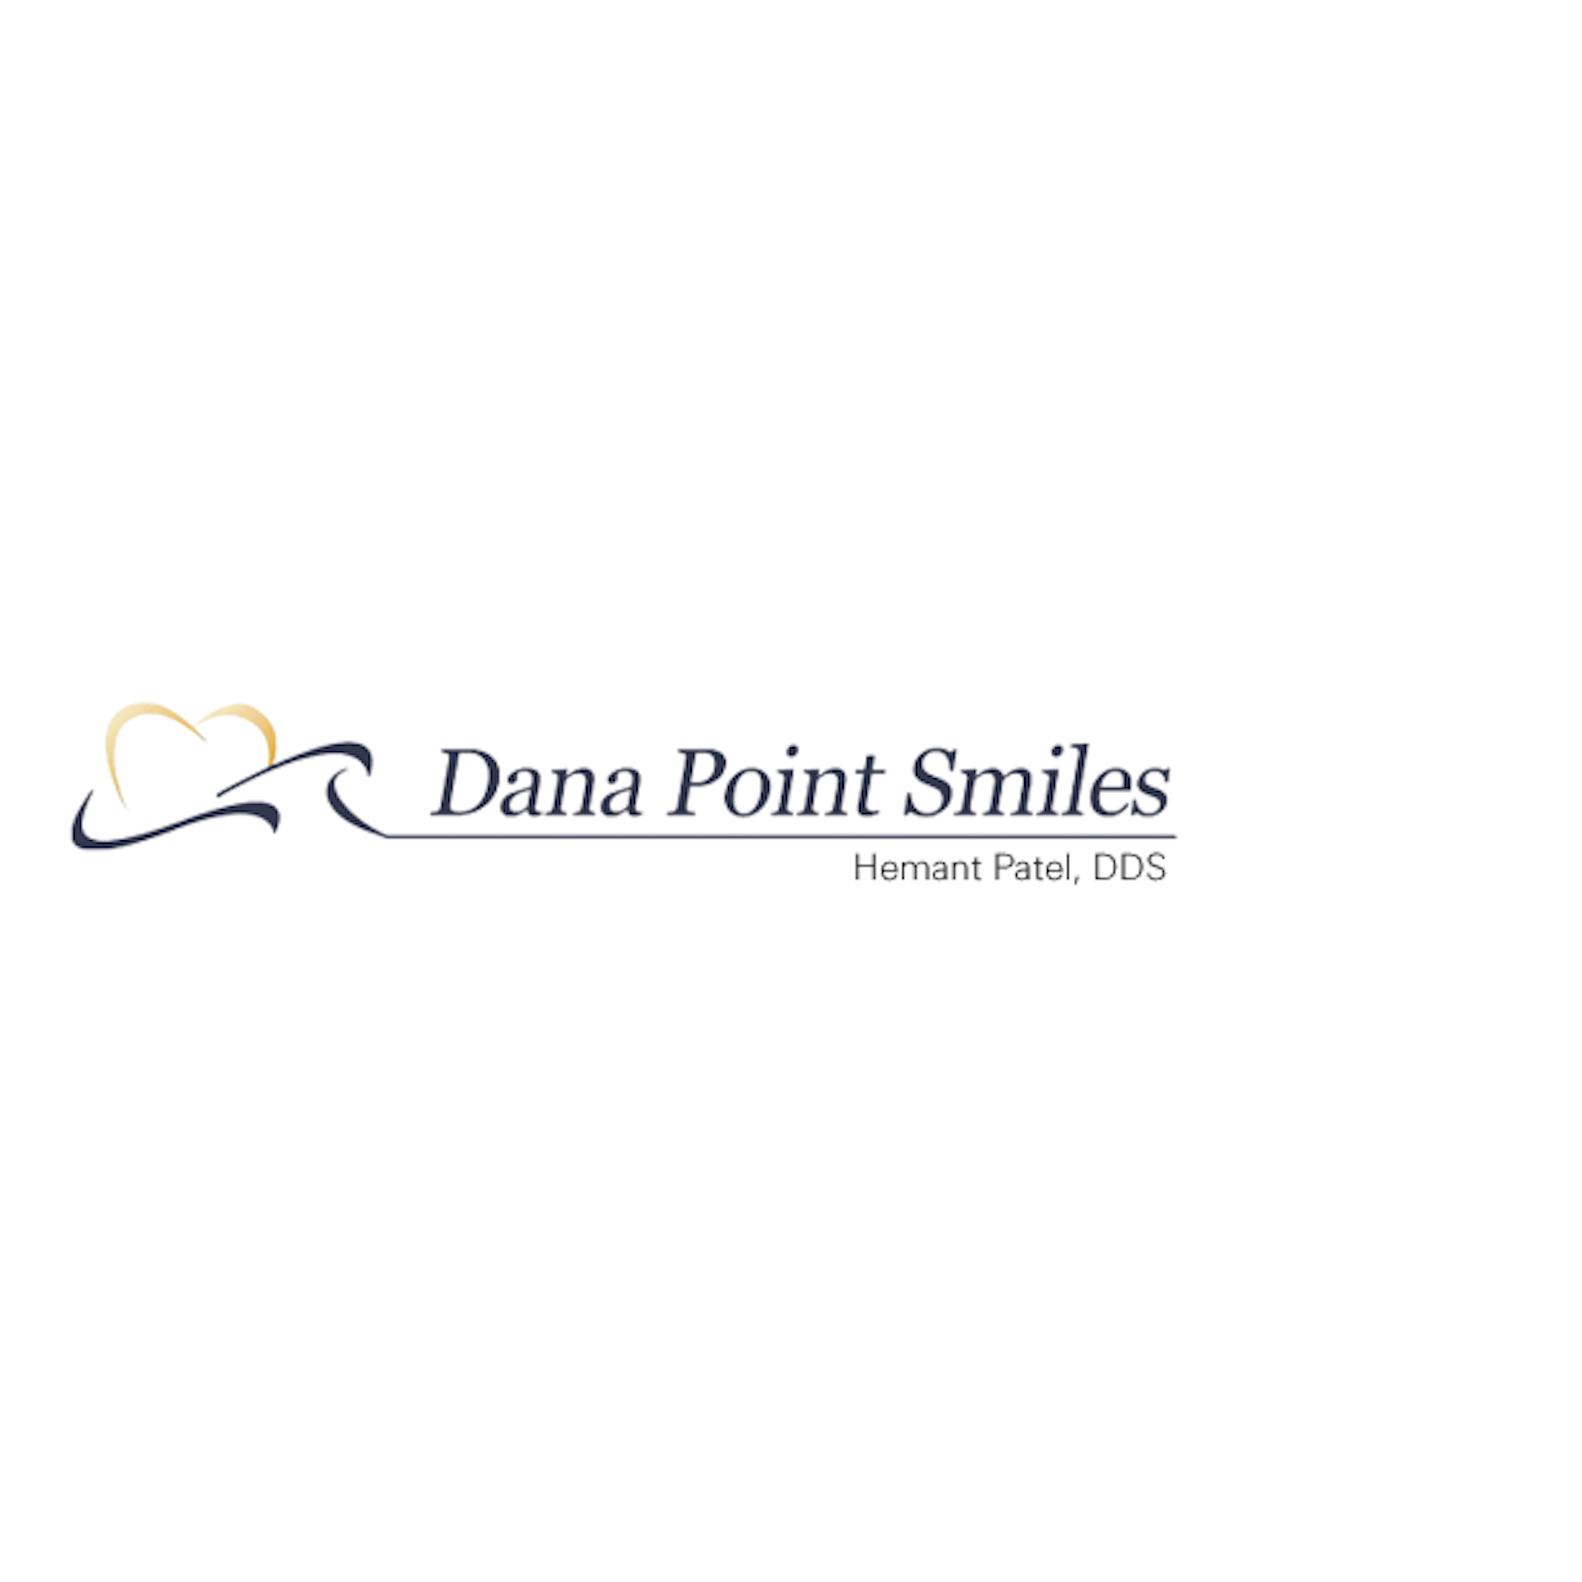 Dana Point Smiles - Dr. Hemant Patel DDS